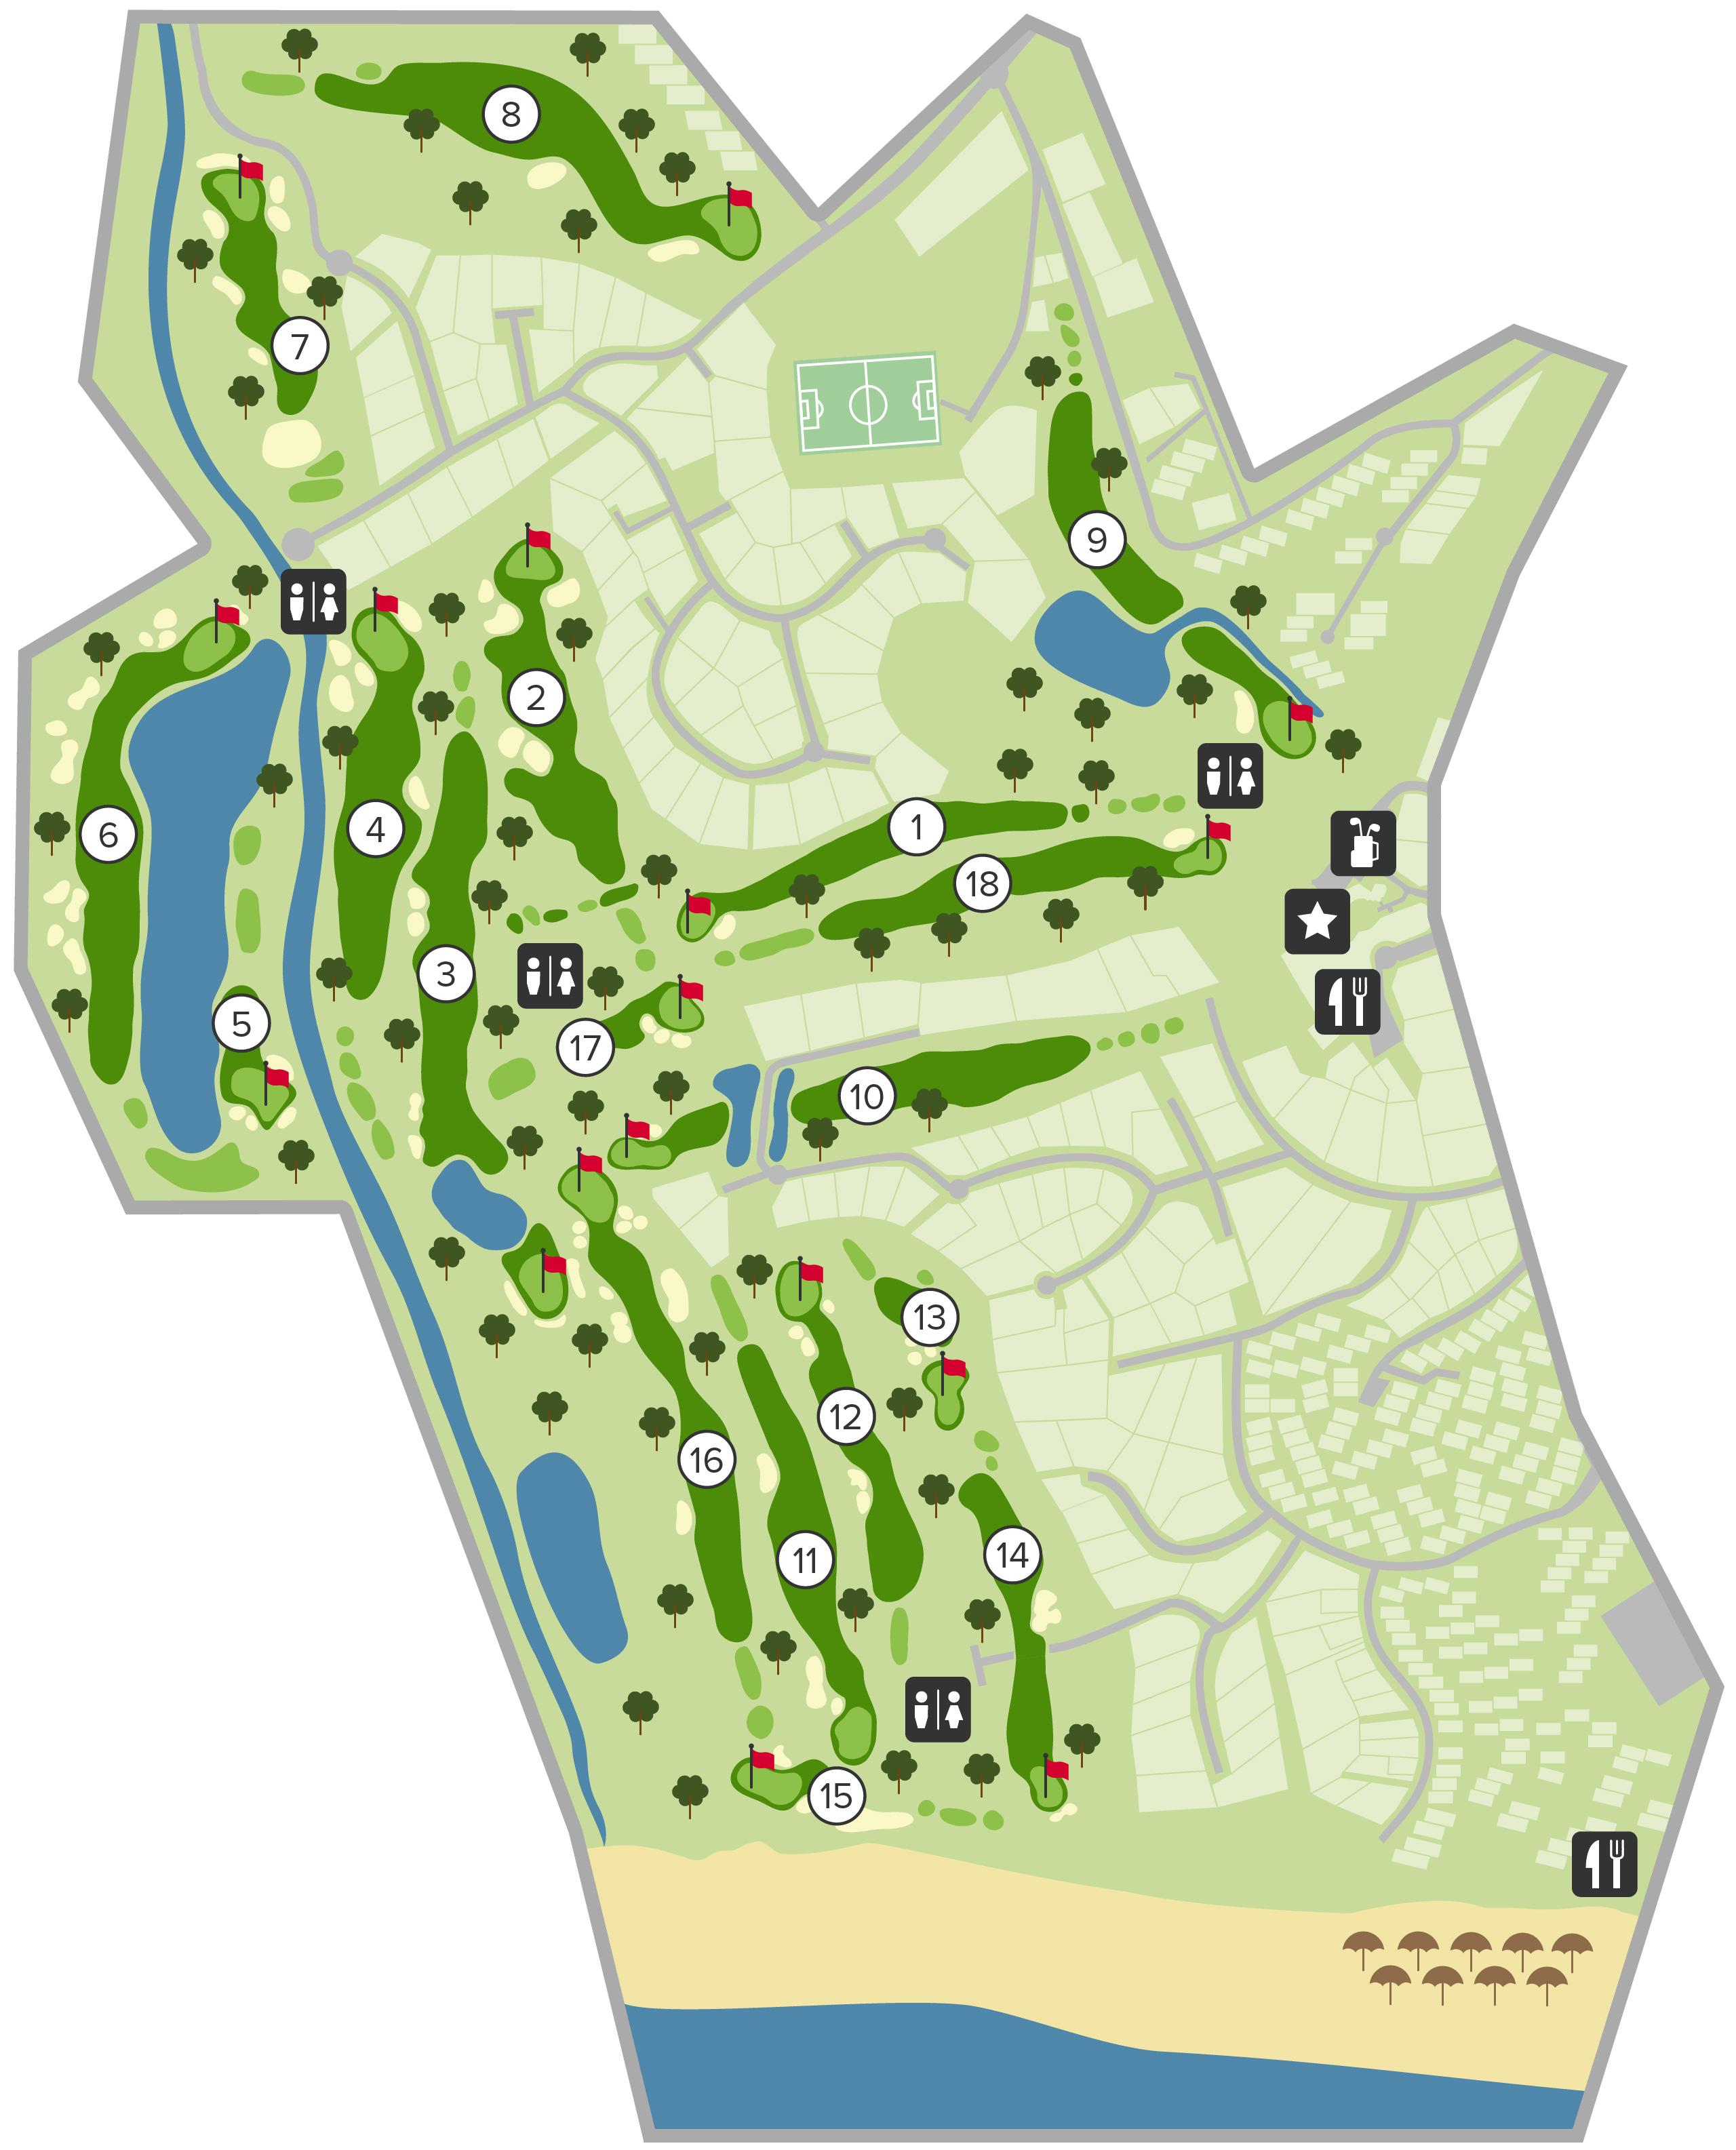 mapa rinchoa Ocean Golf Course   Vale do Lobo   Portugal mapa rinchoa